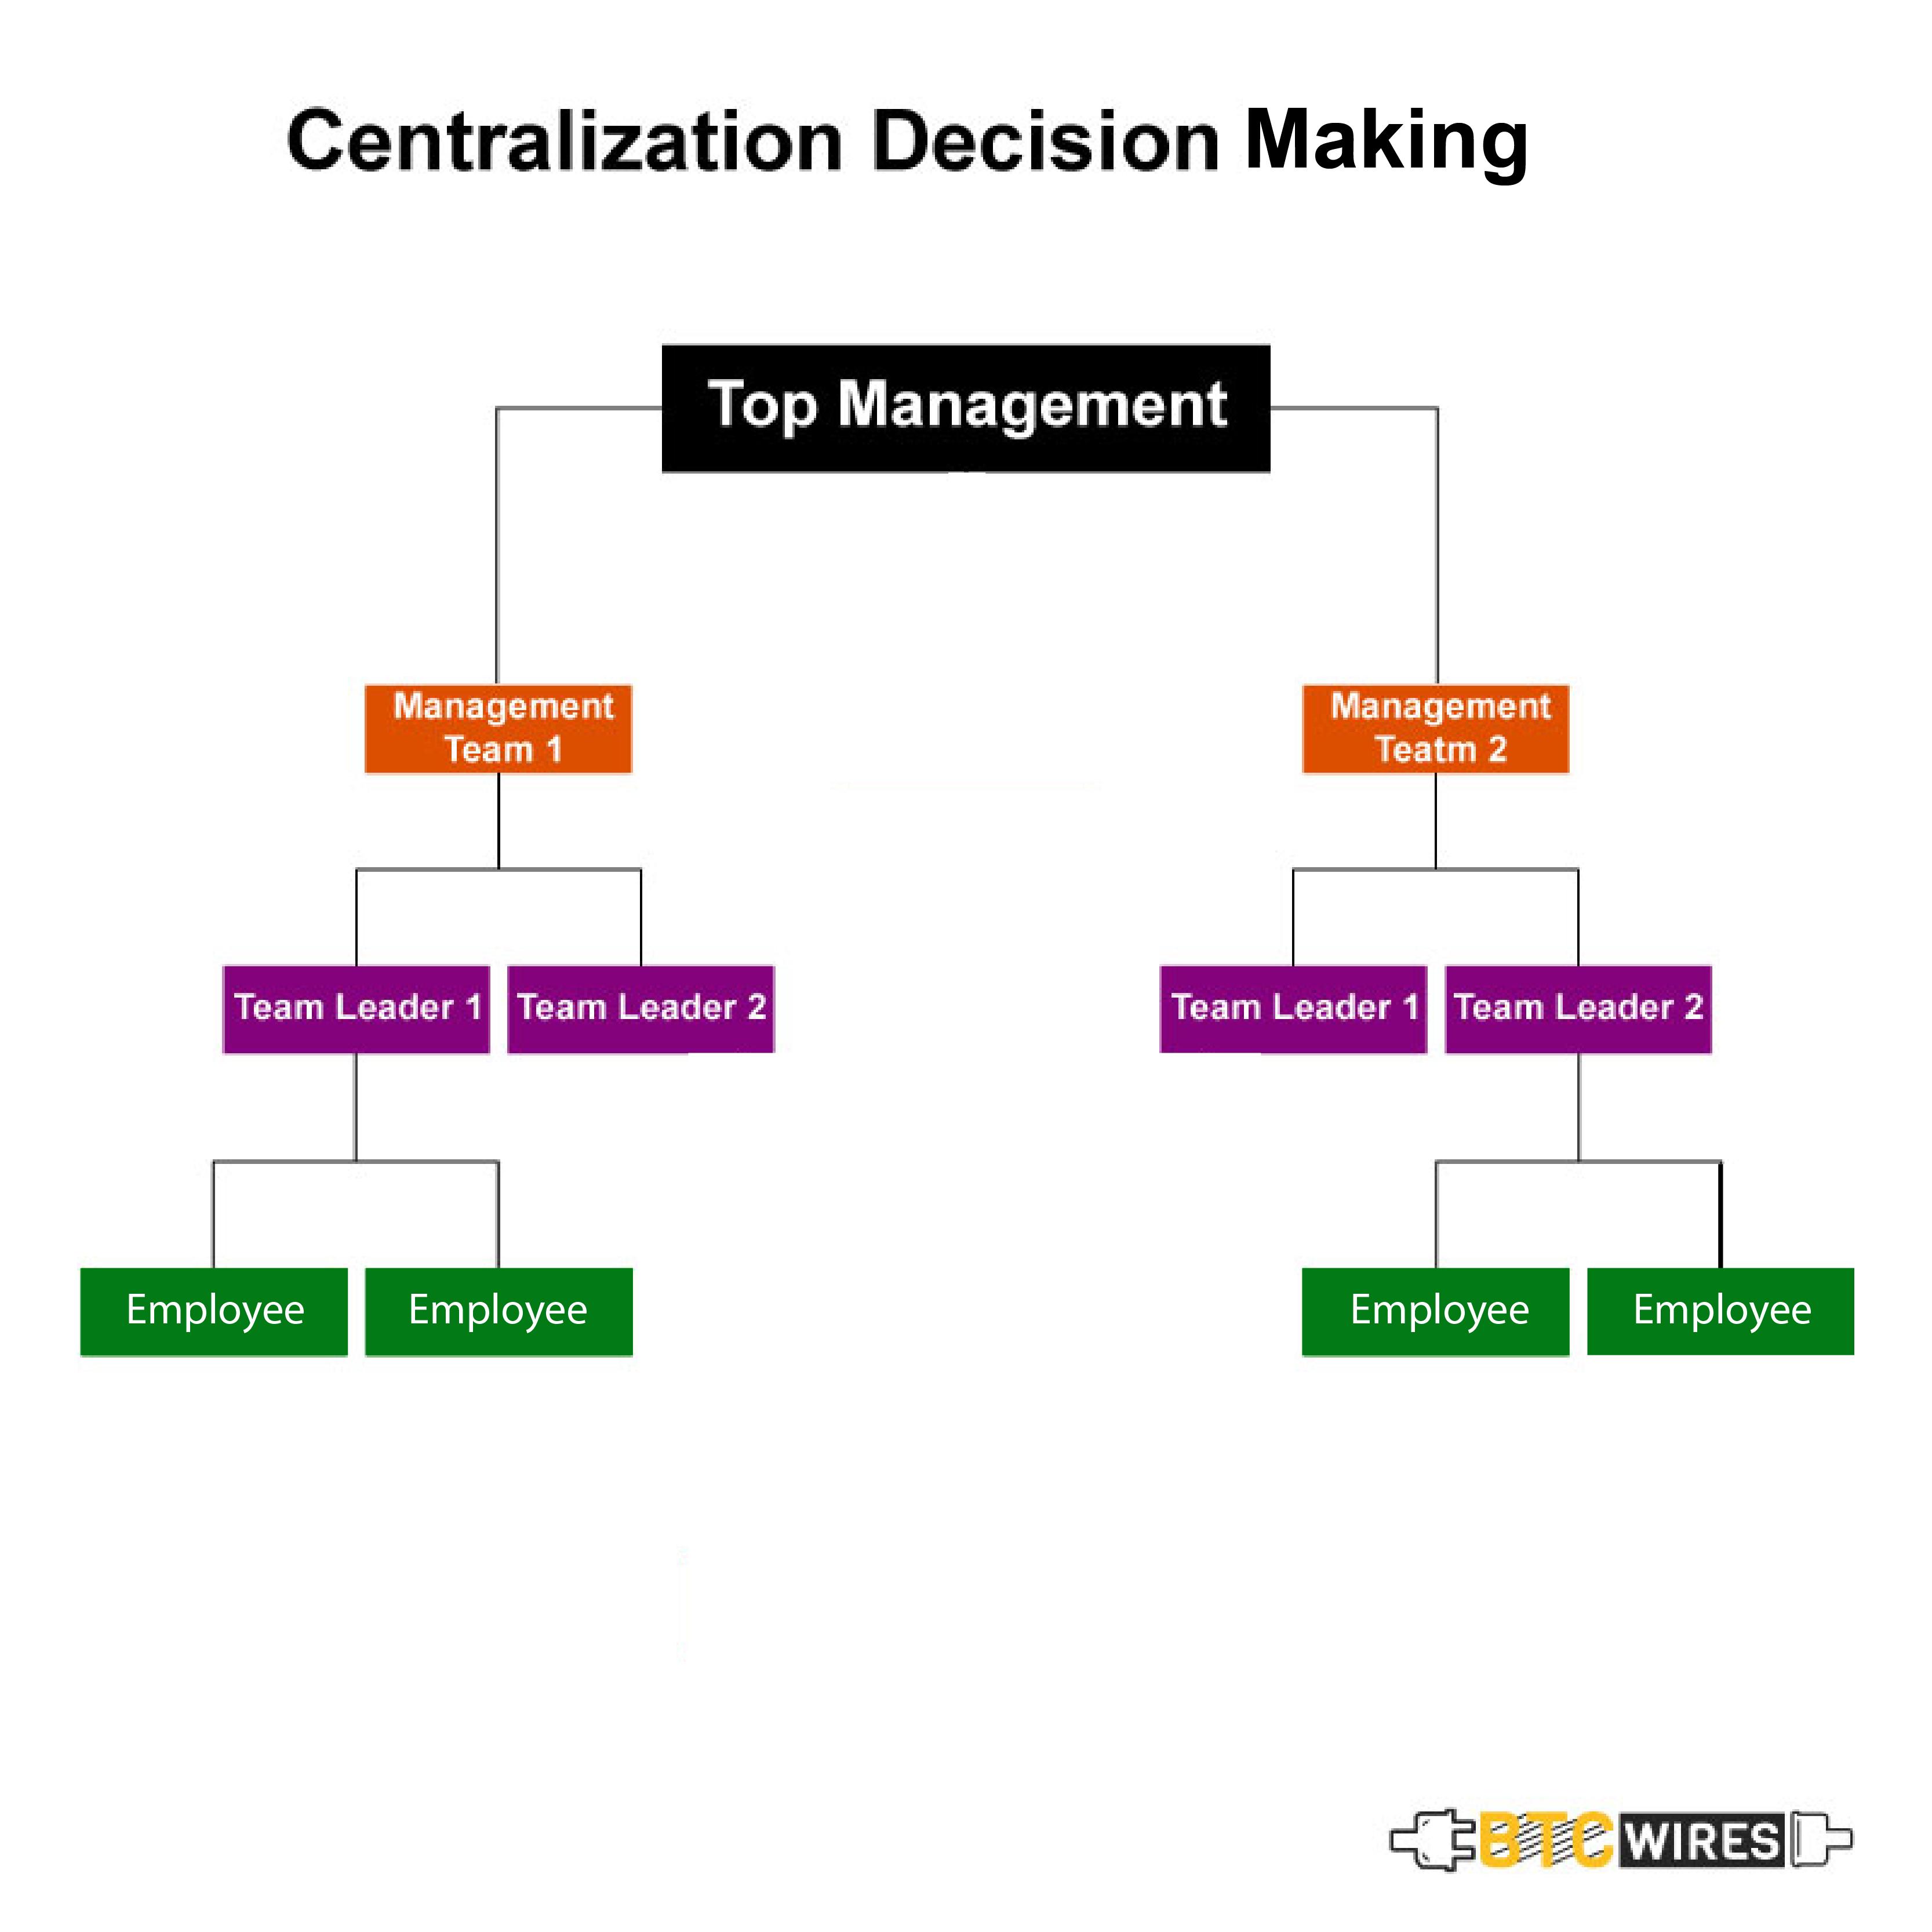 Centralization tree